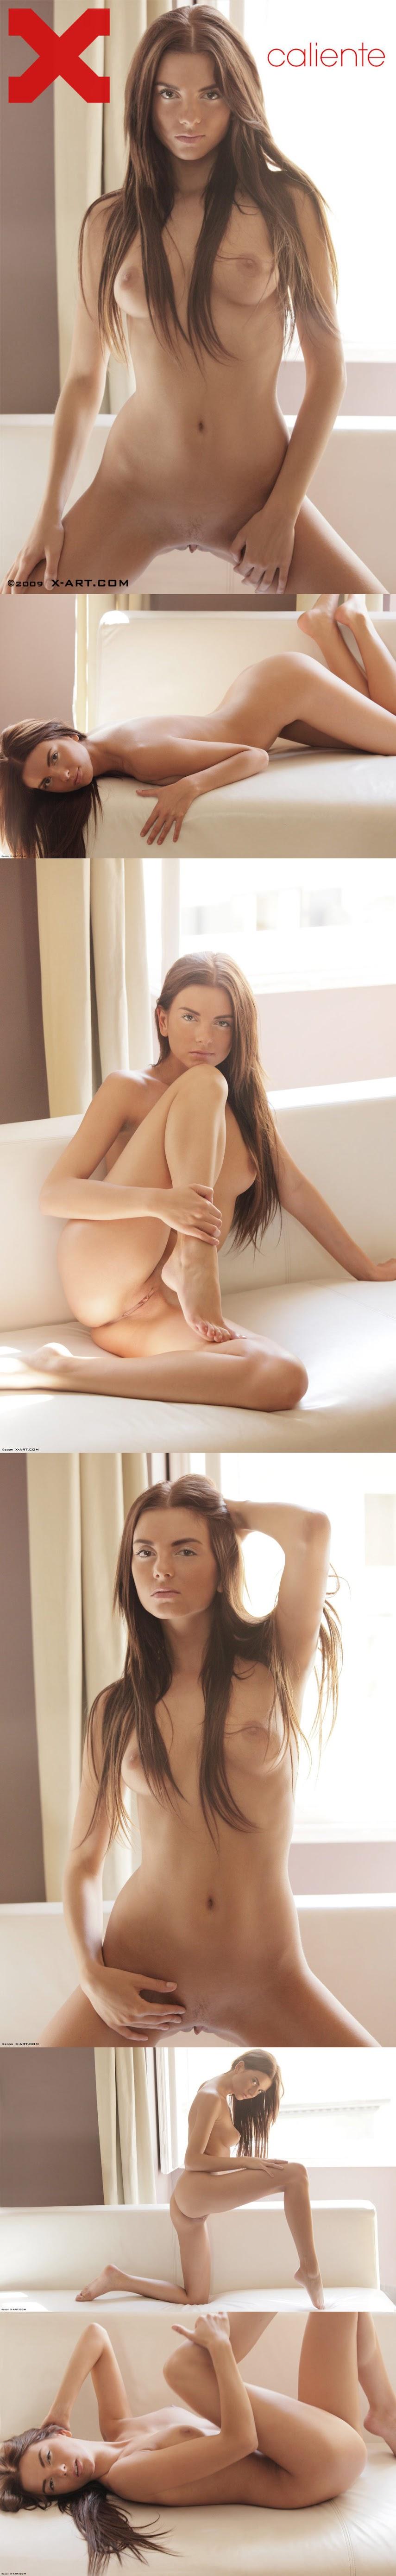 x-art monika caliente-lrg - Girlsdelta